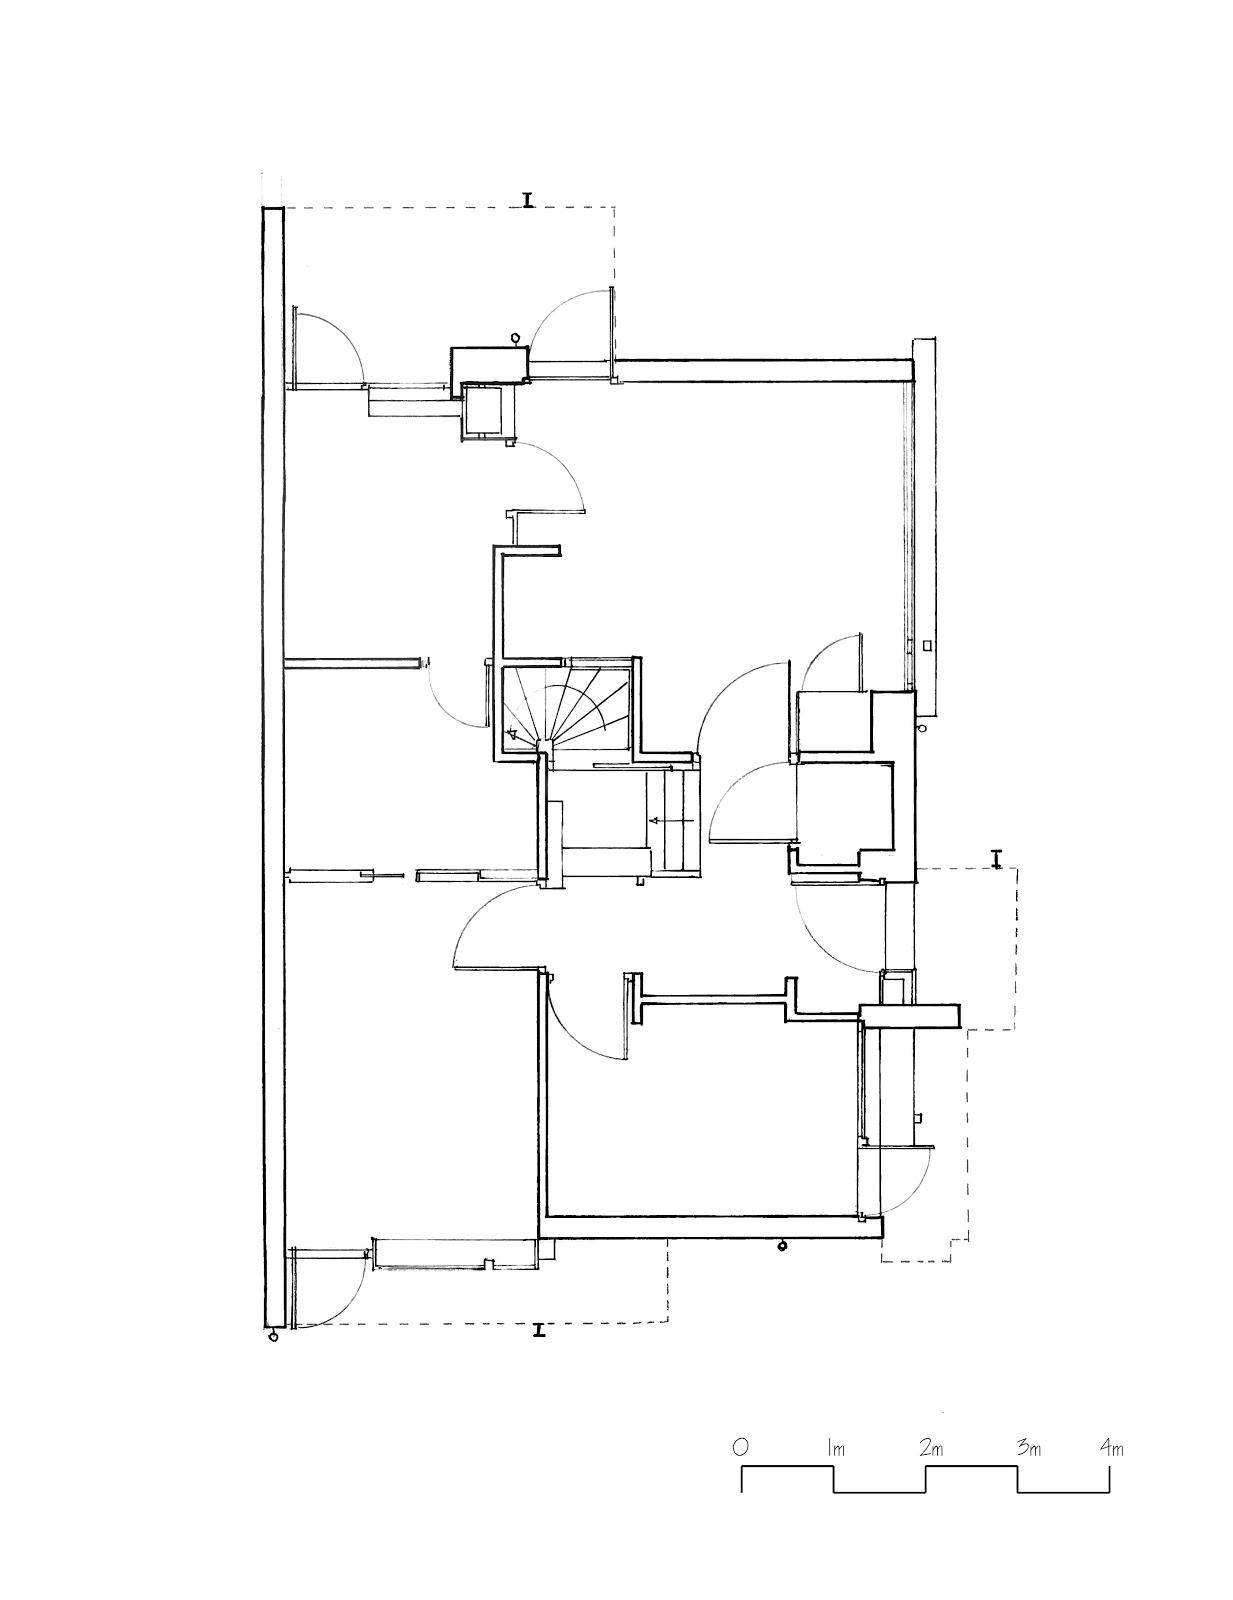 Basic House Drawing At Getdrawings